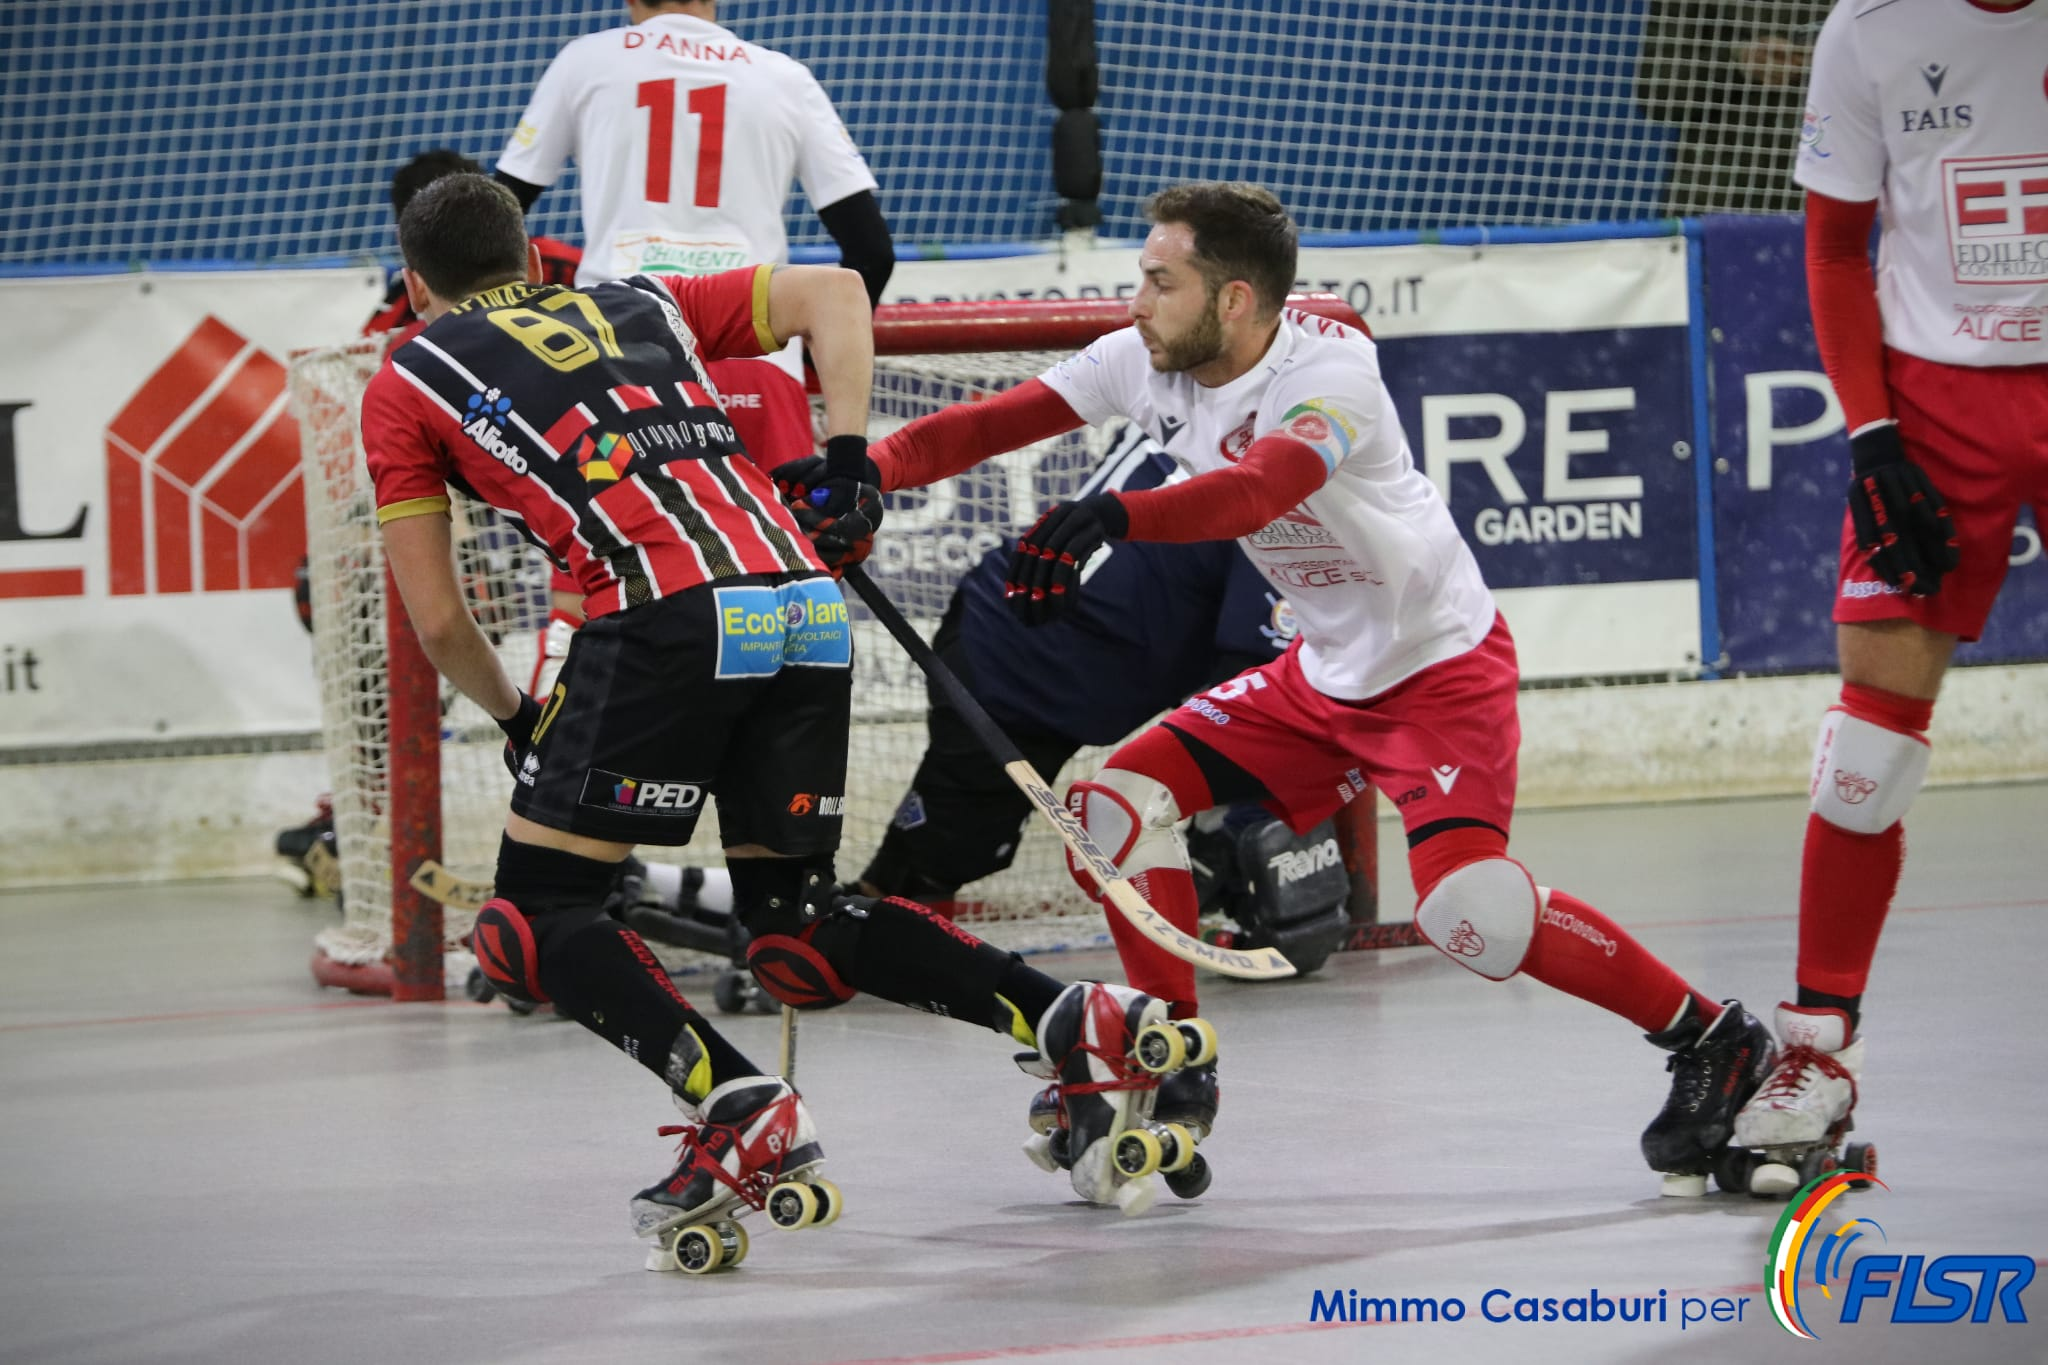 hockey-pista-serie-A-circolo-pattinatori-Edilfox-Sarzana-Saavedra